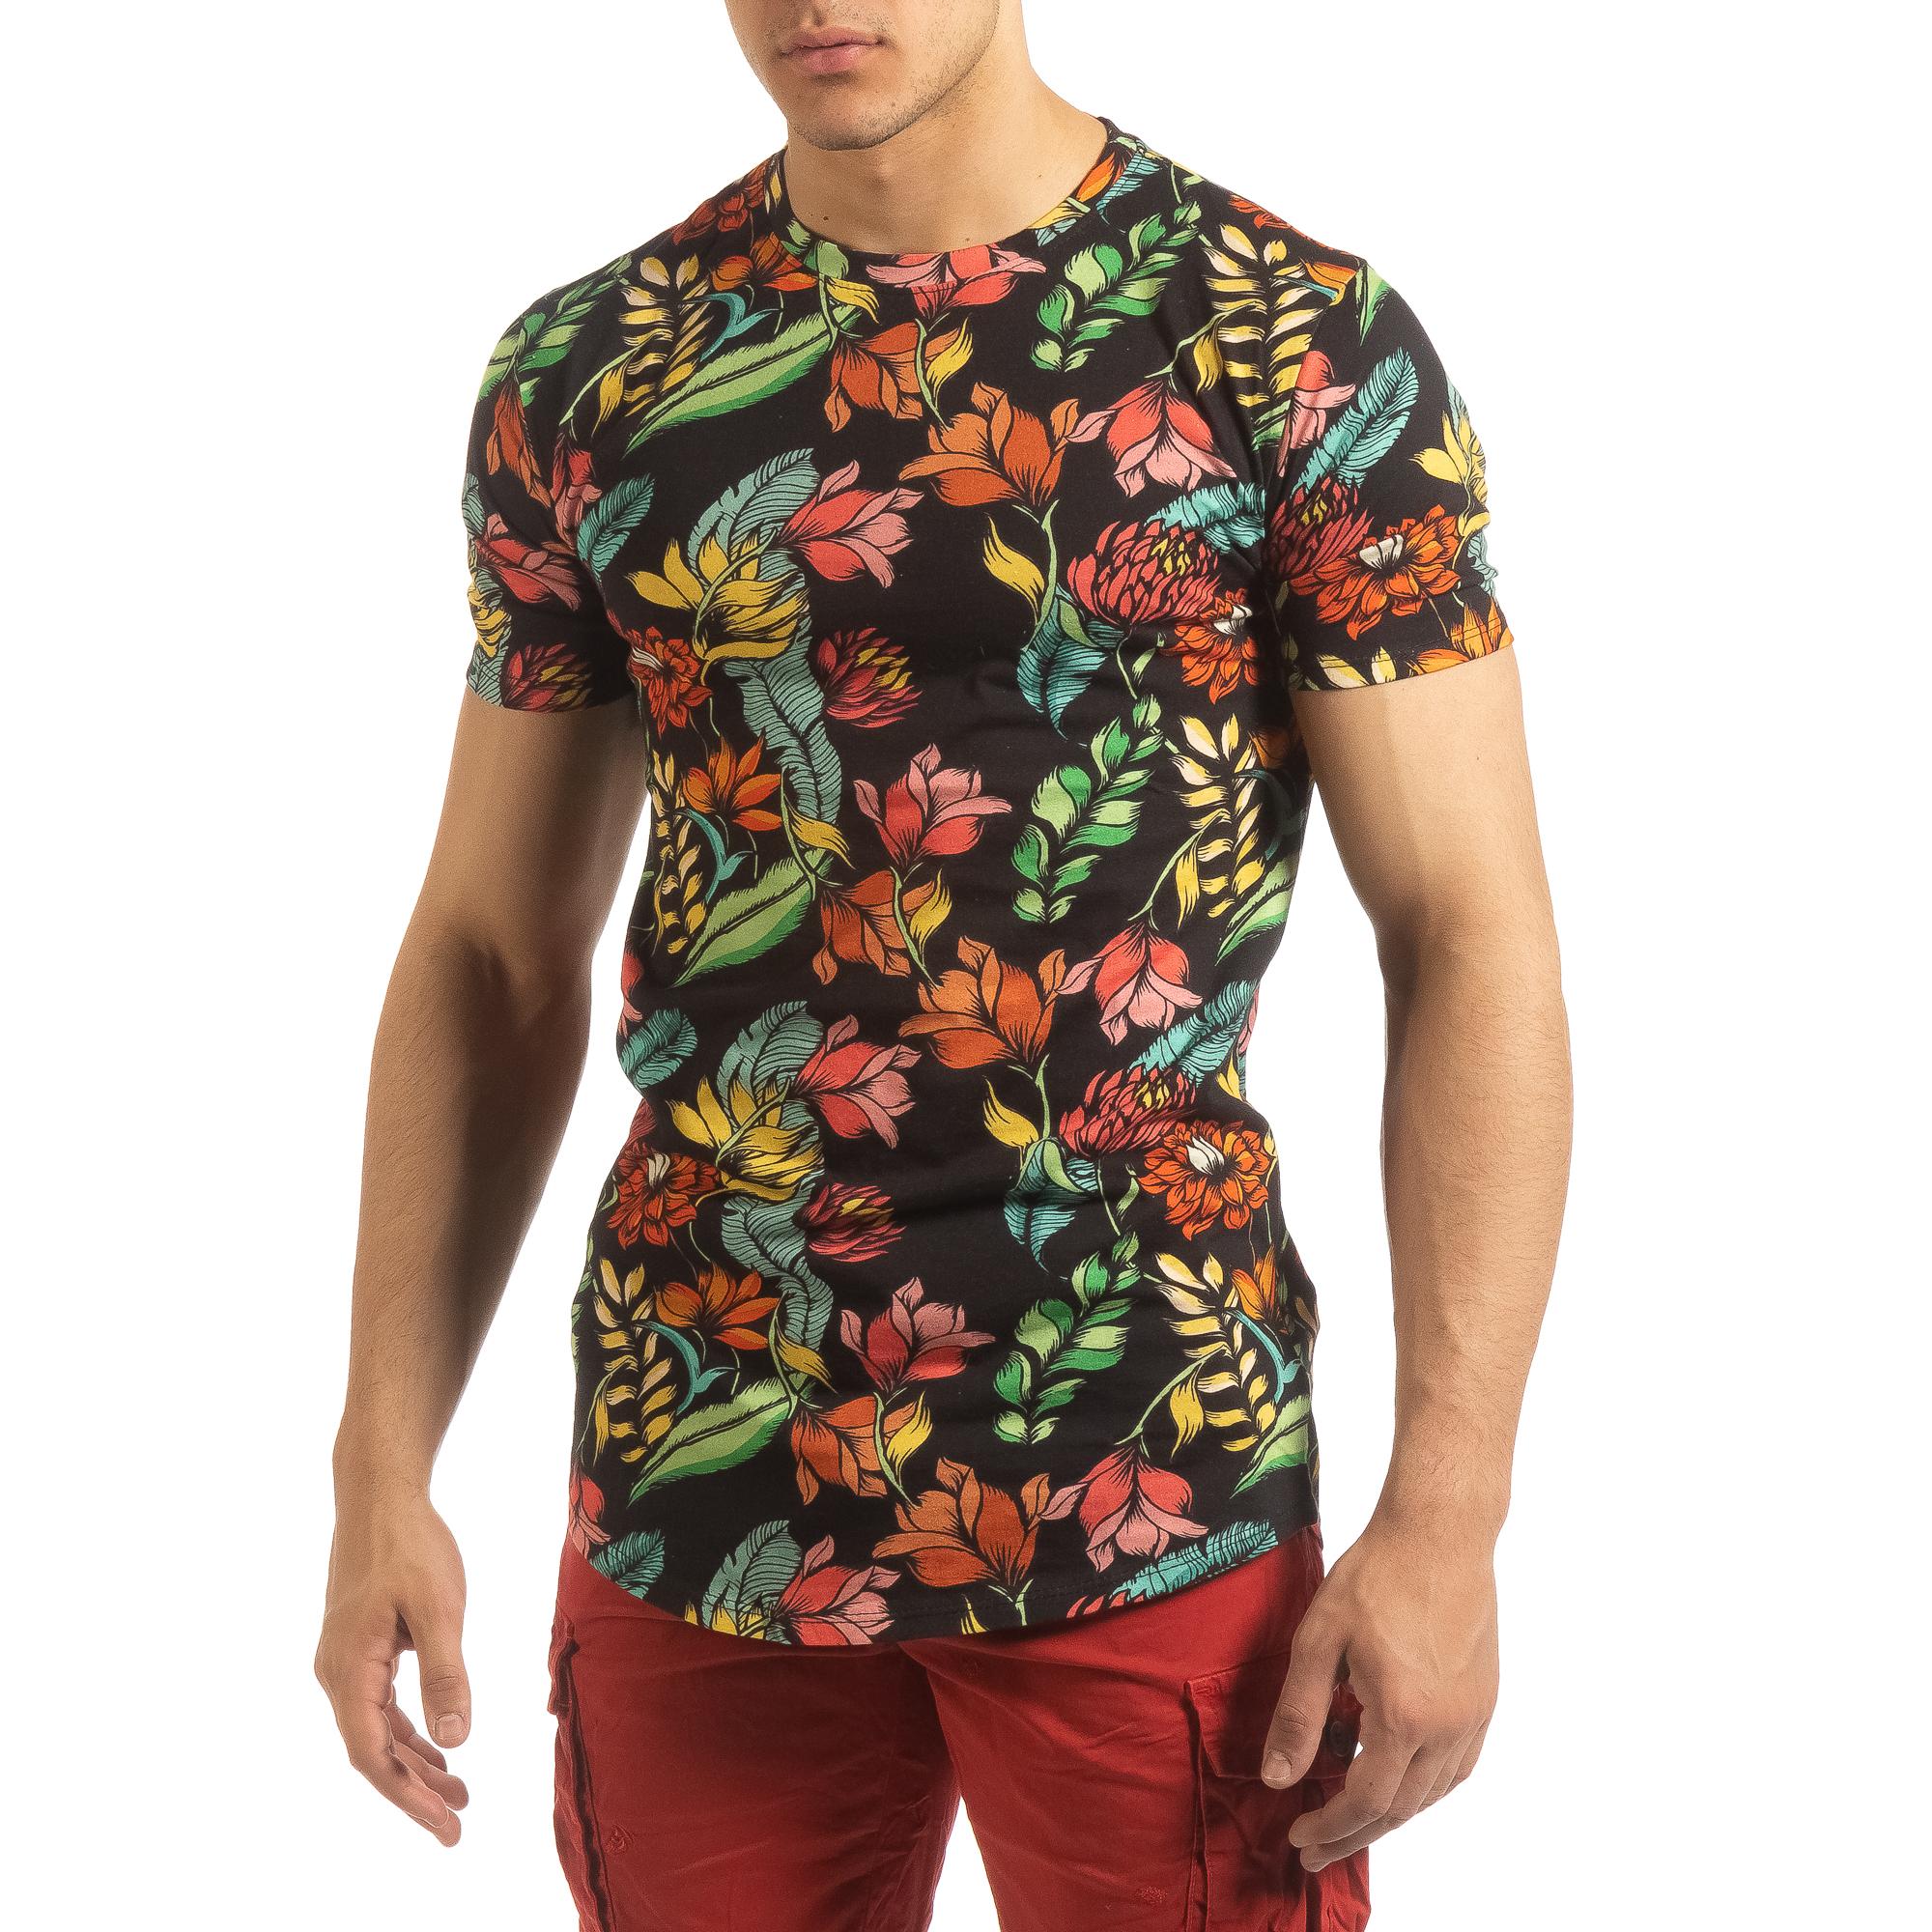 4f6bf4aa74ac Ανδρική πολύχρωμη φλοράλ κοντομάνικη μπλούζα